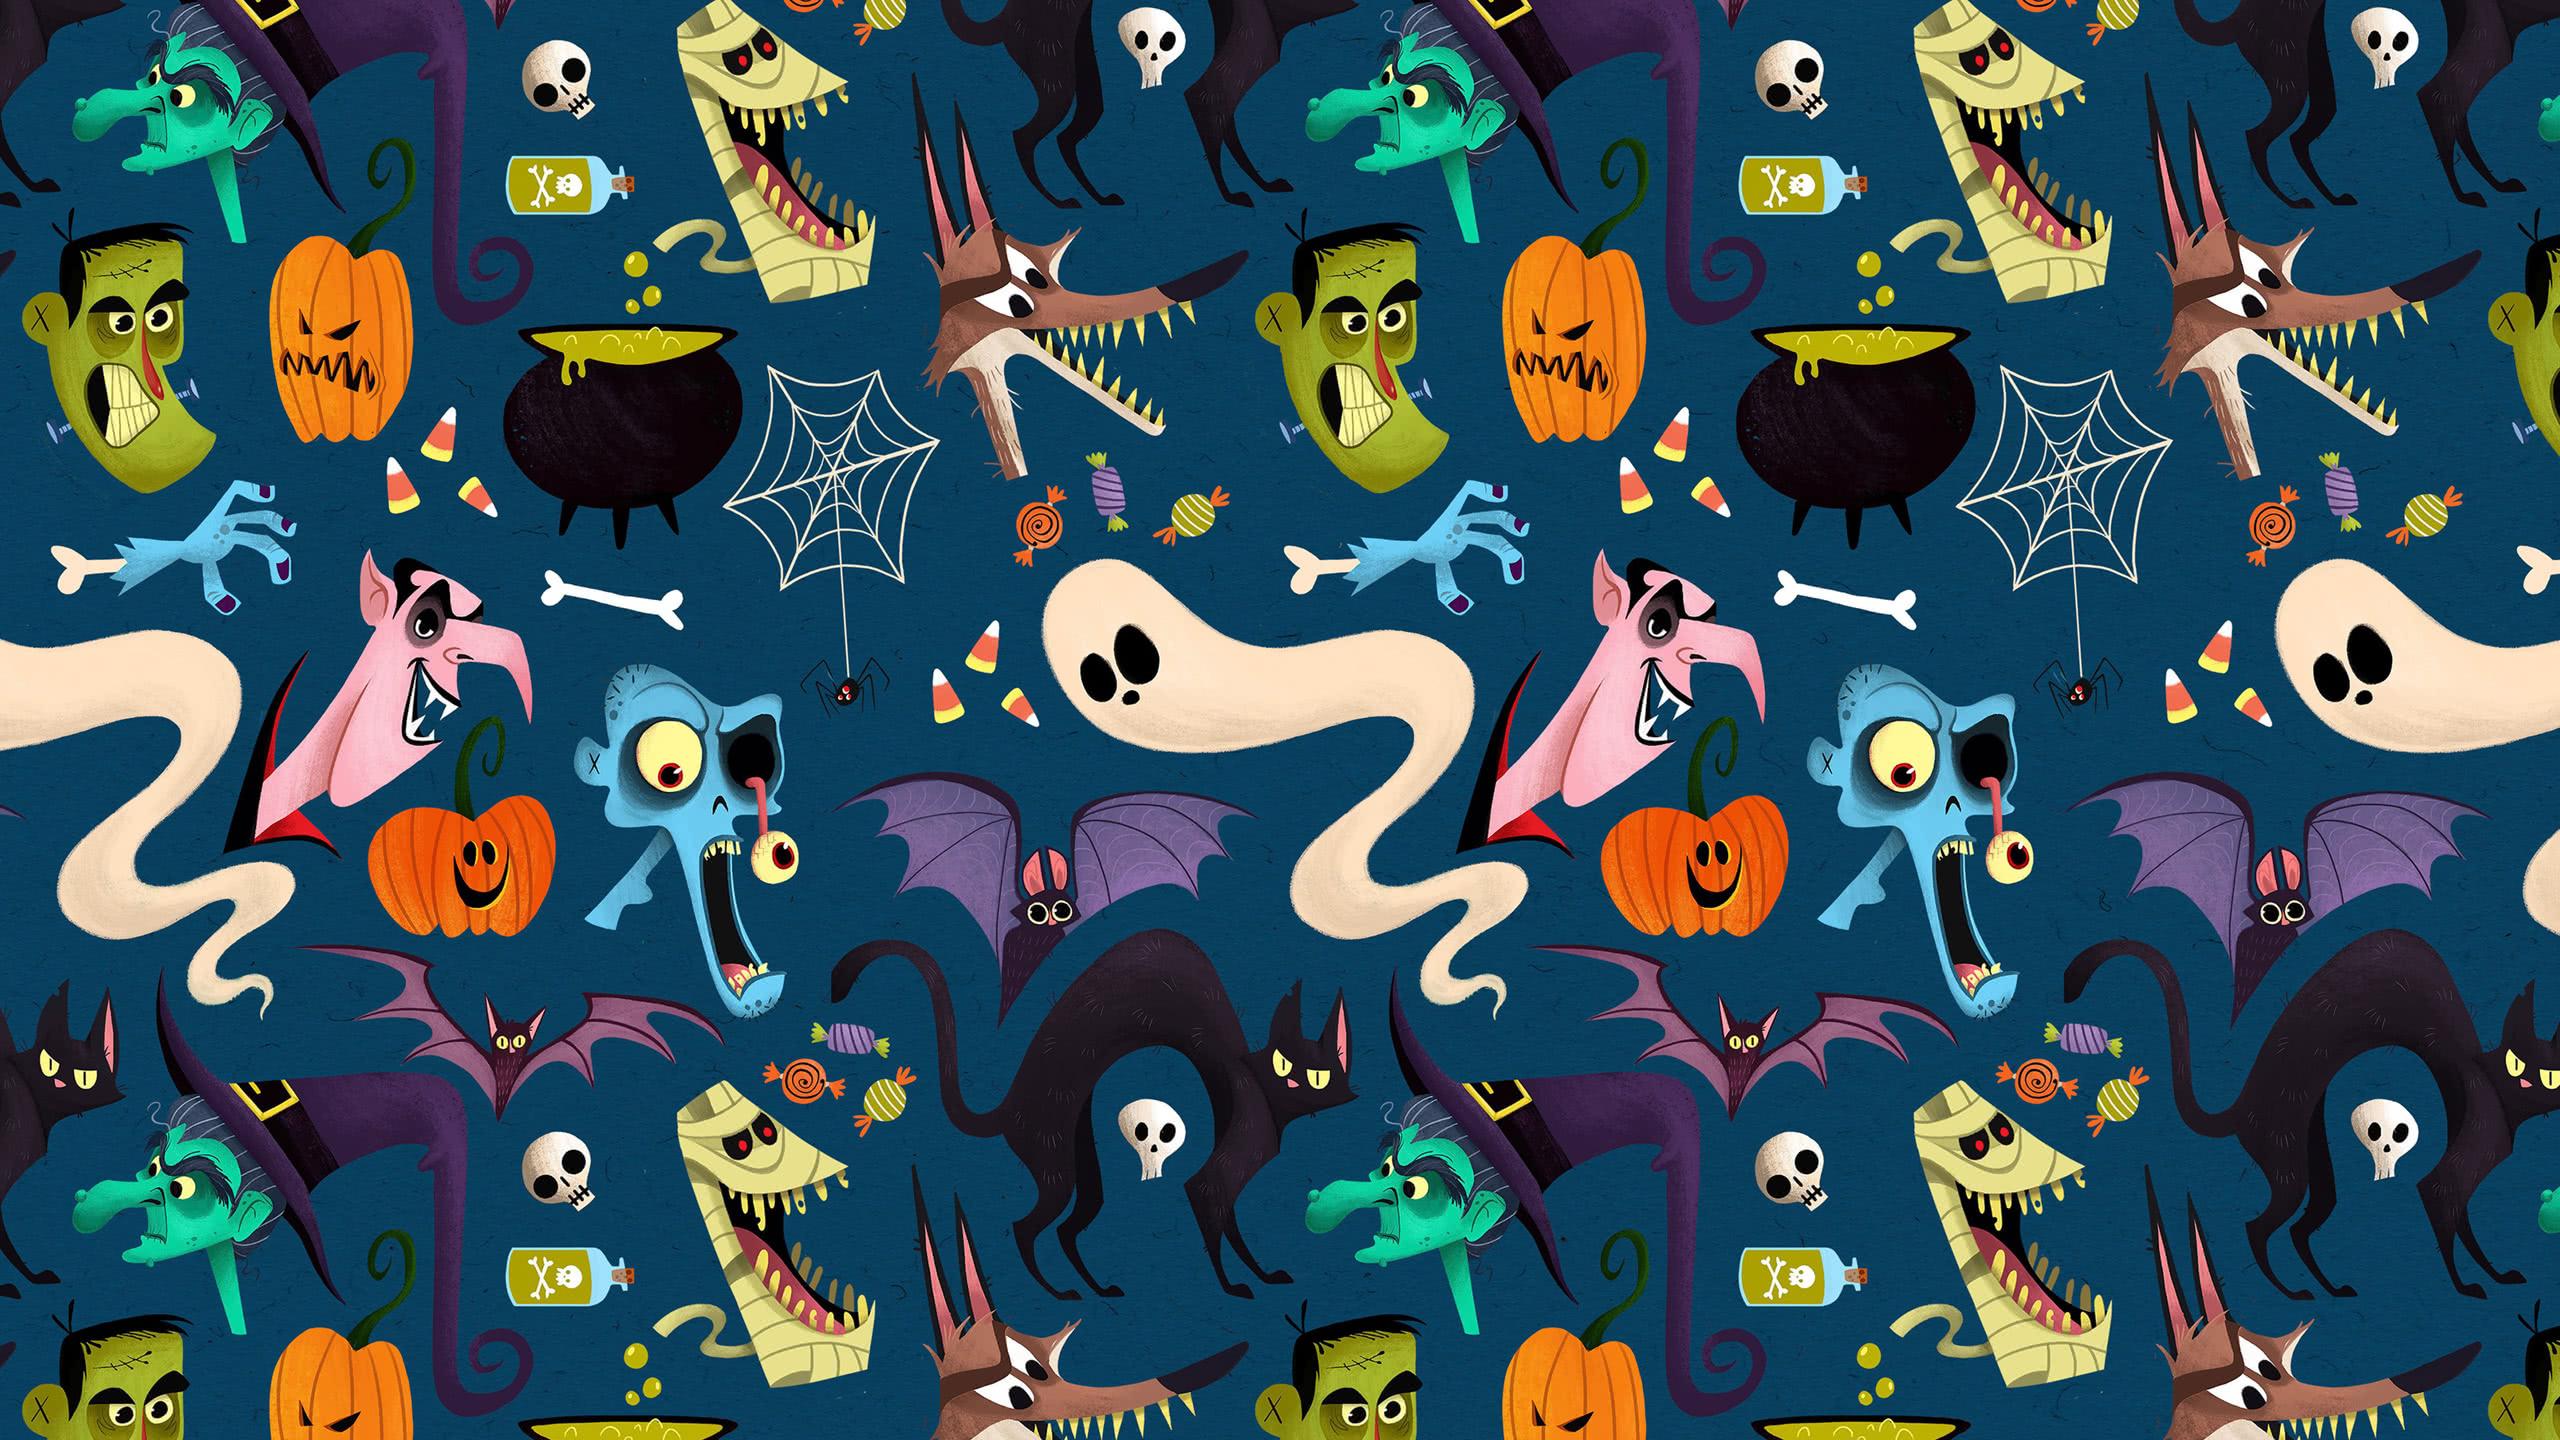 Halloween Pattern Wallpaper.Halloween Pattern Wqhd 1440p Wallpaper Pixelz